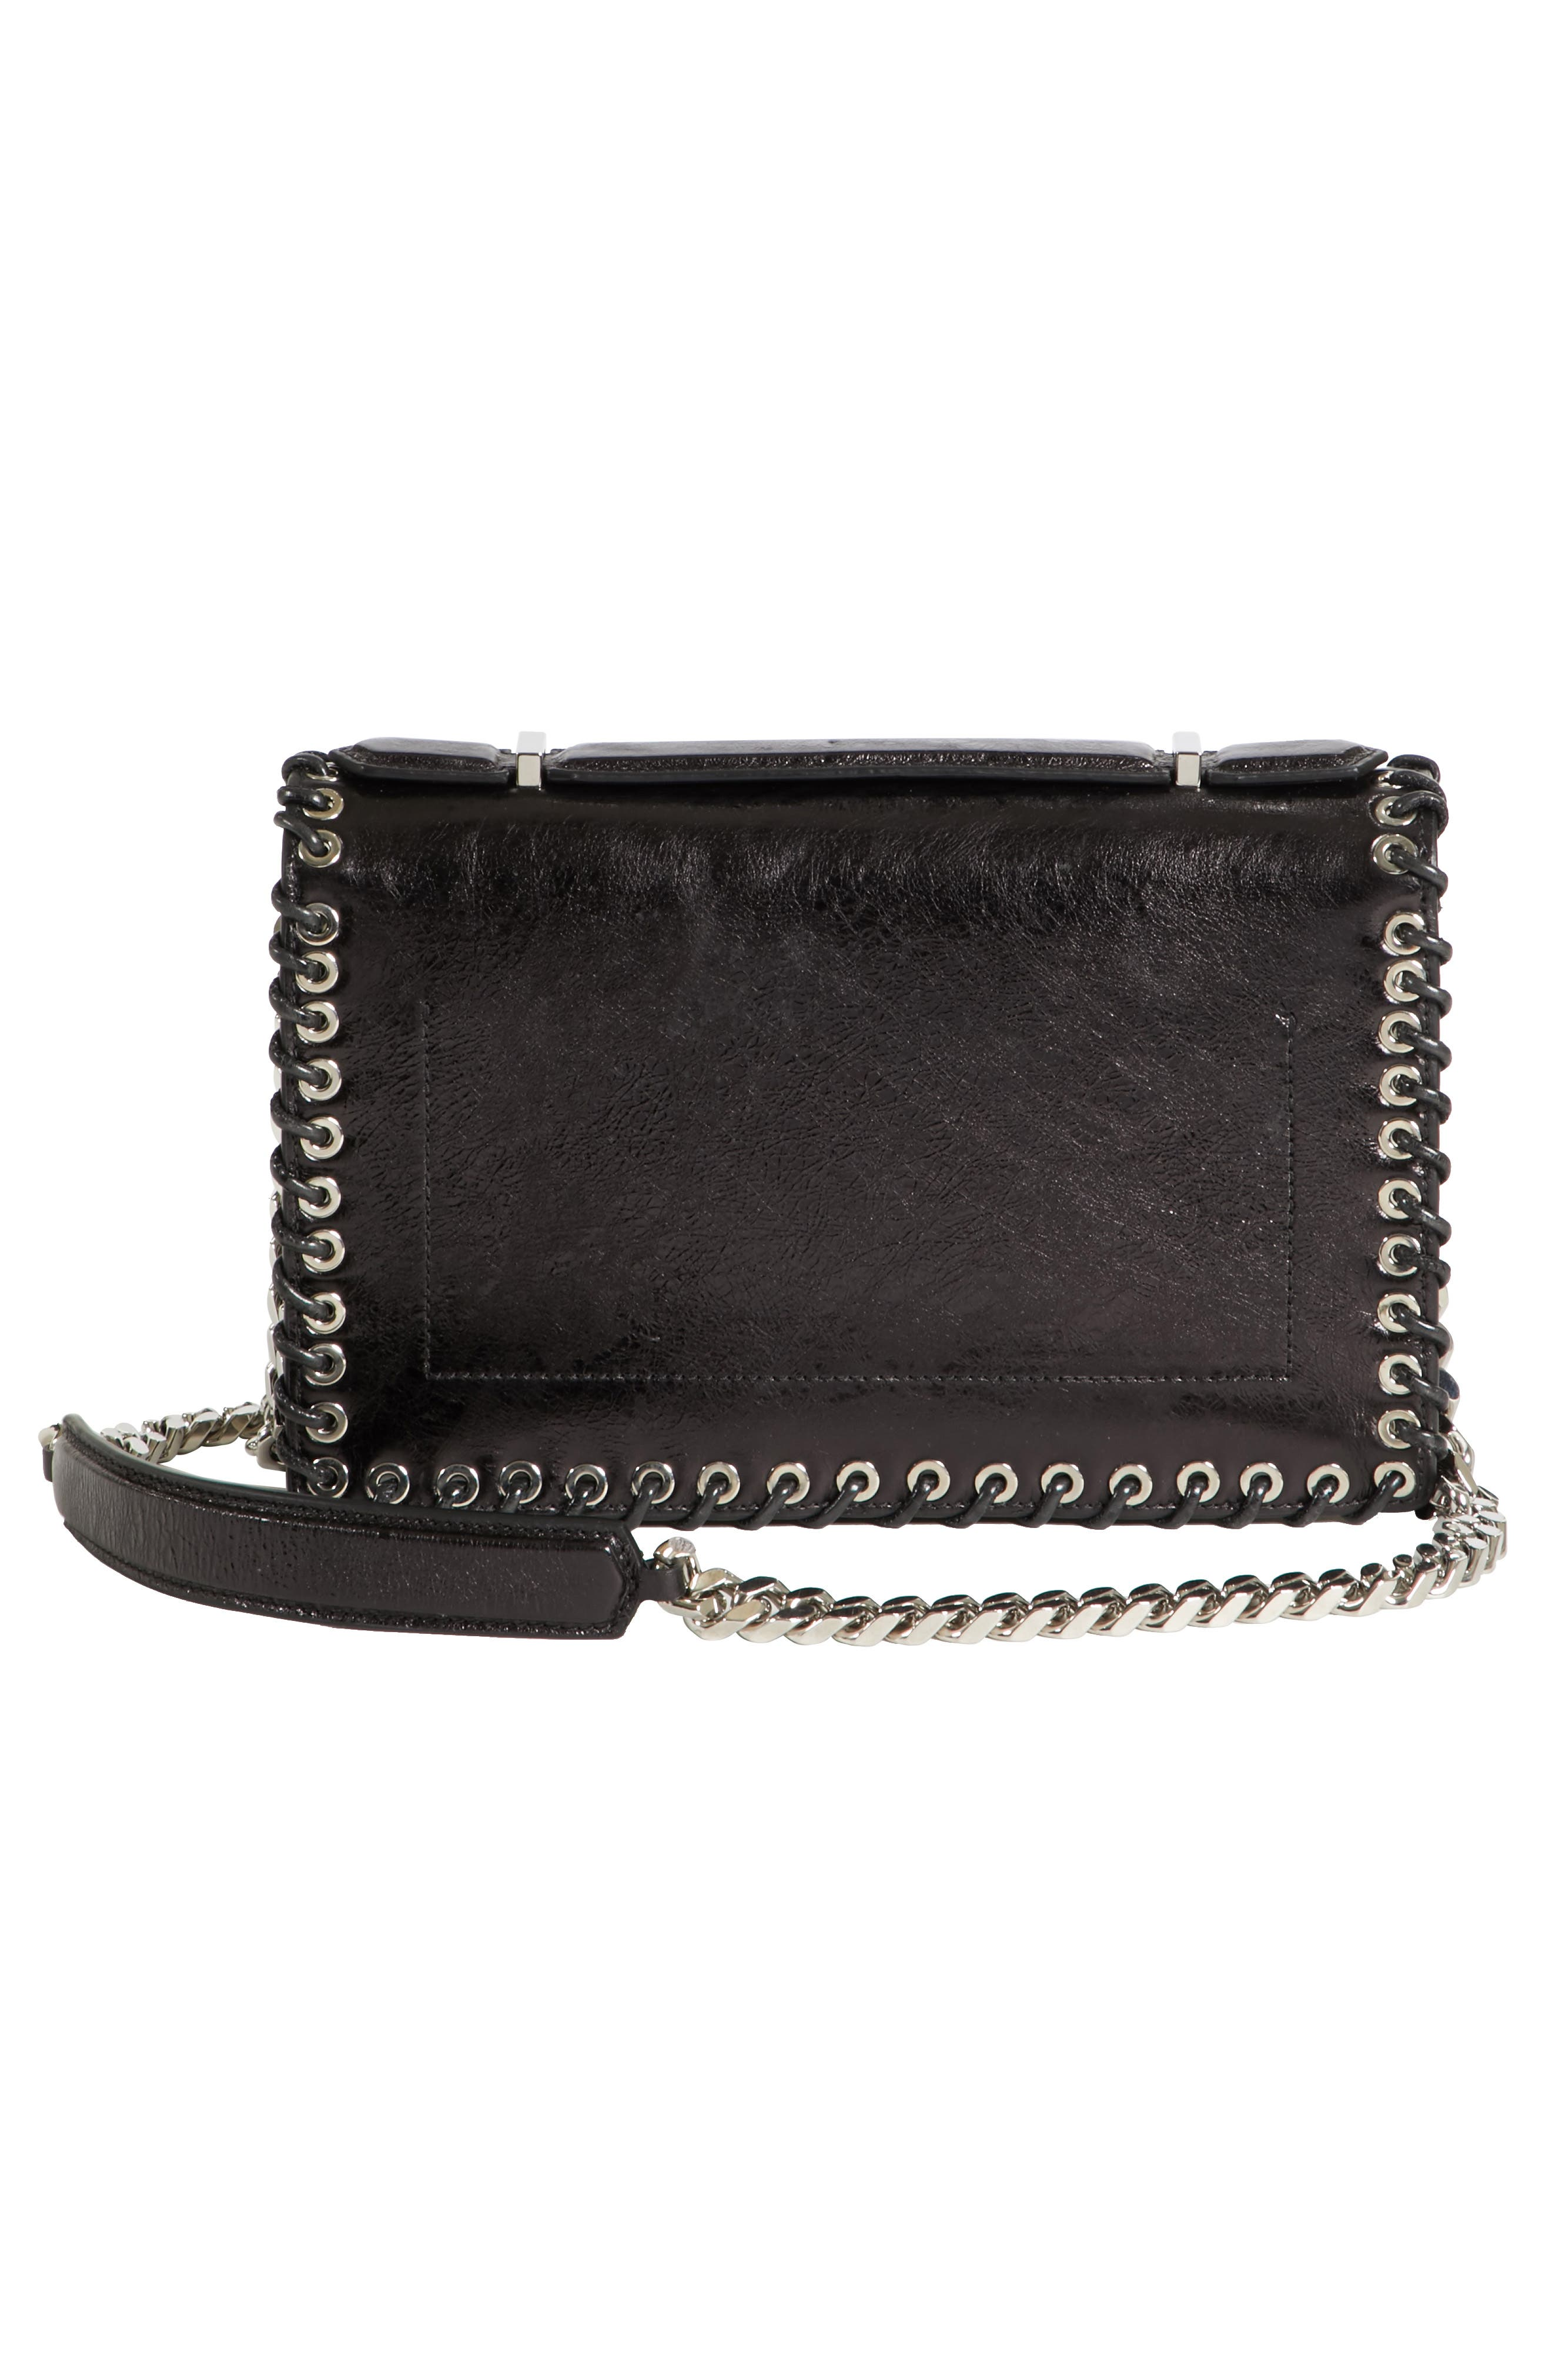 Alternate Image 3  - CALVIN KLEIN 205W39NYC Whipstitch Leather Shoulder Bag